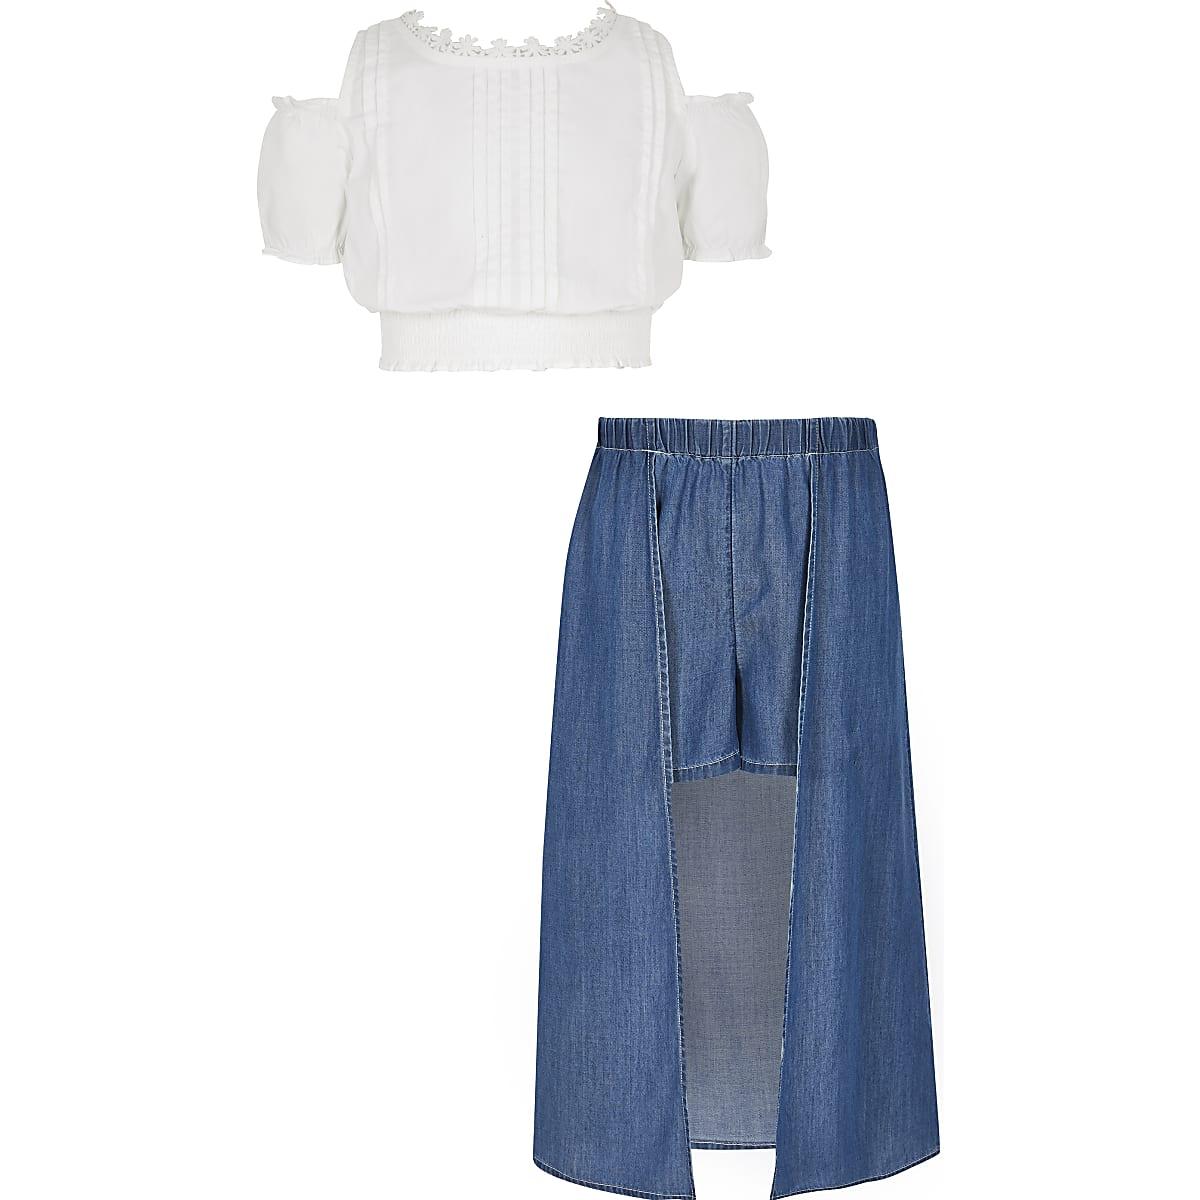 Girls blue denim skort outfit